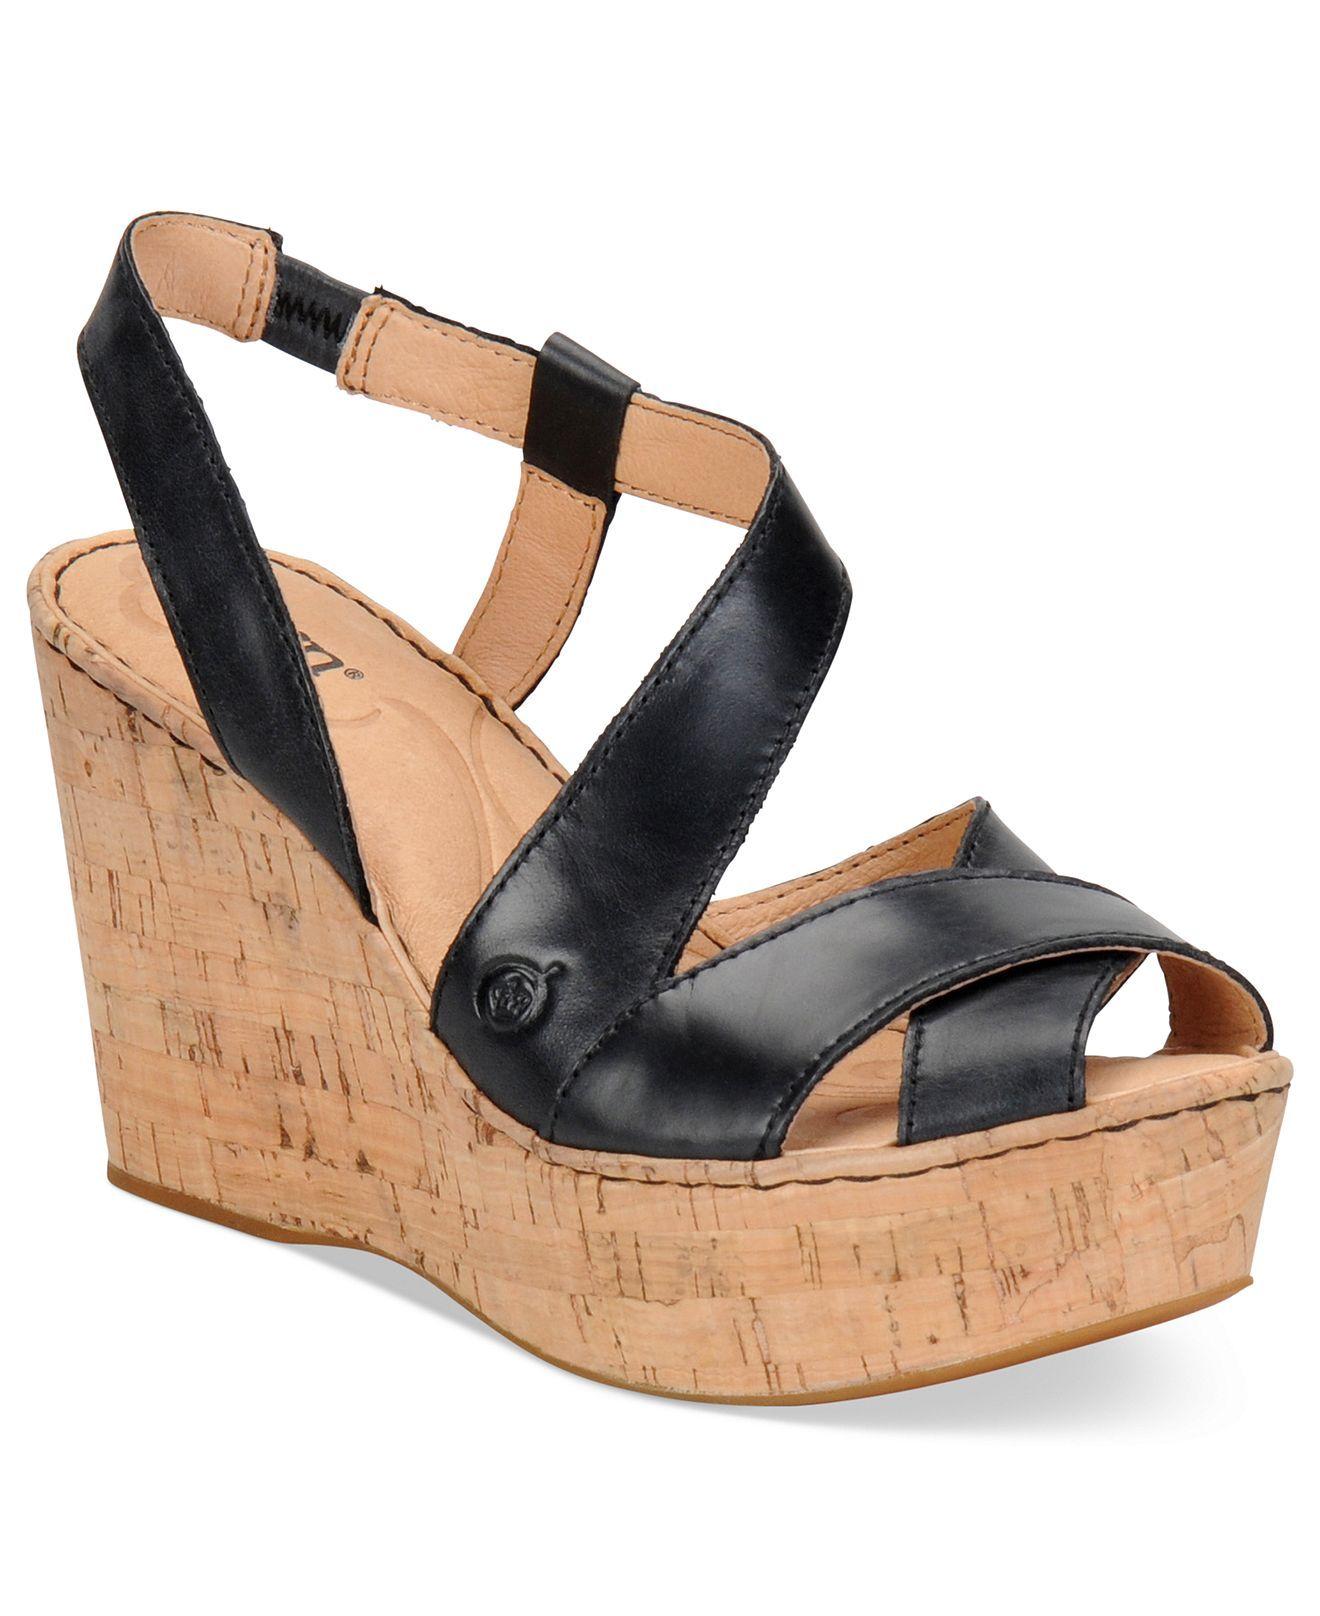 zi comfortable s comforter dillards most women shoes wedges luggage c